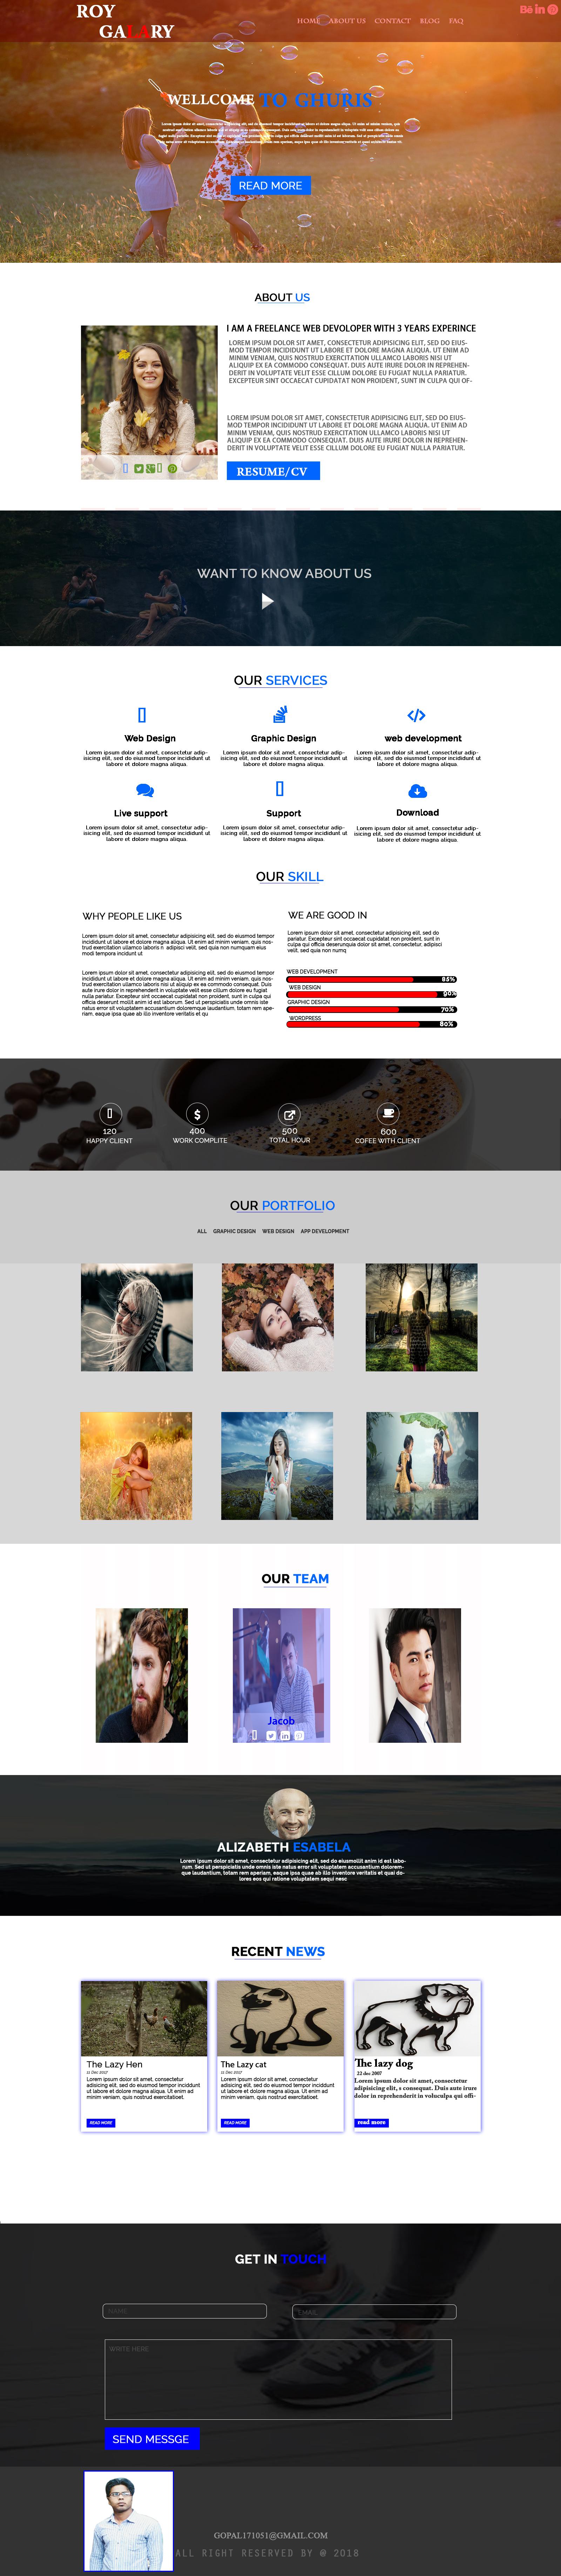 i creat a professional premium psd home page web design